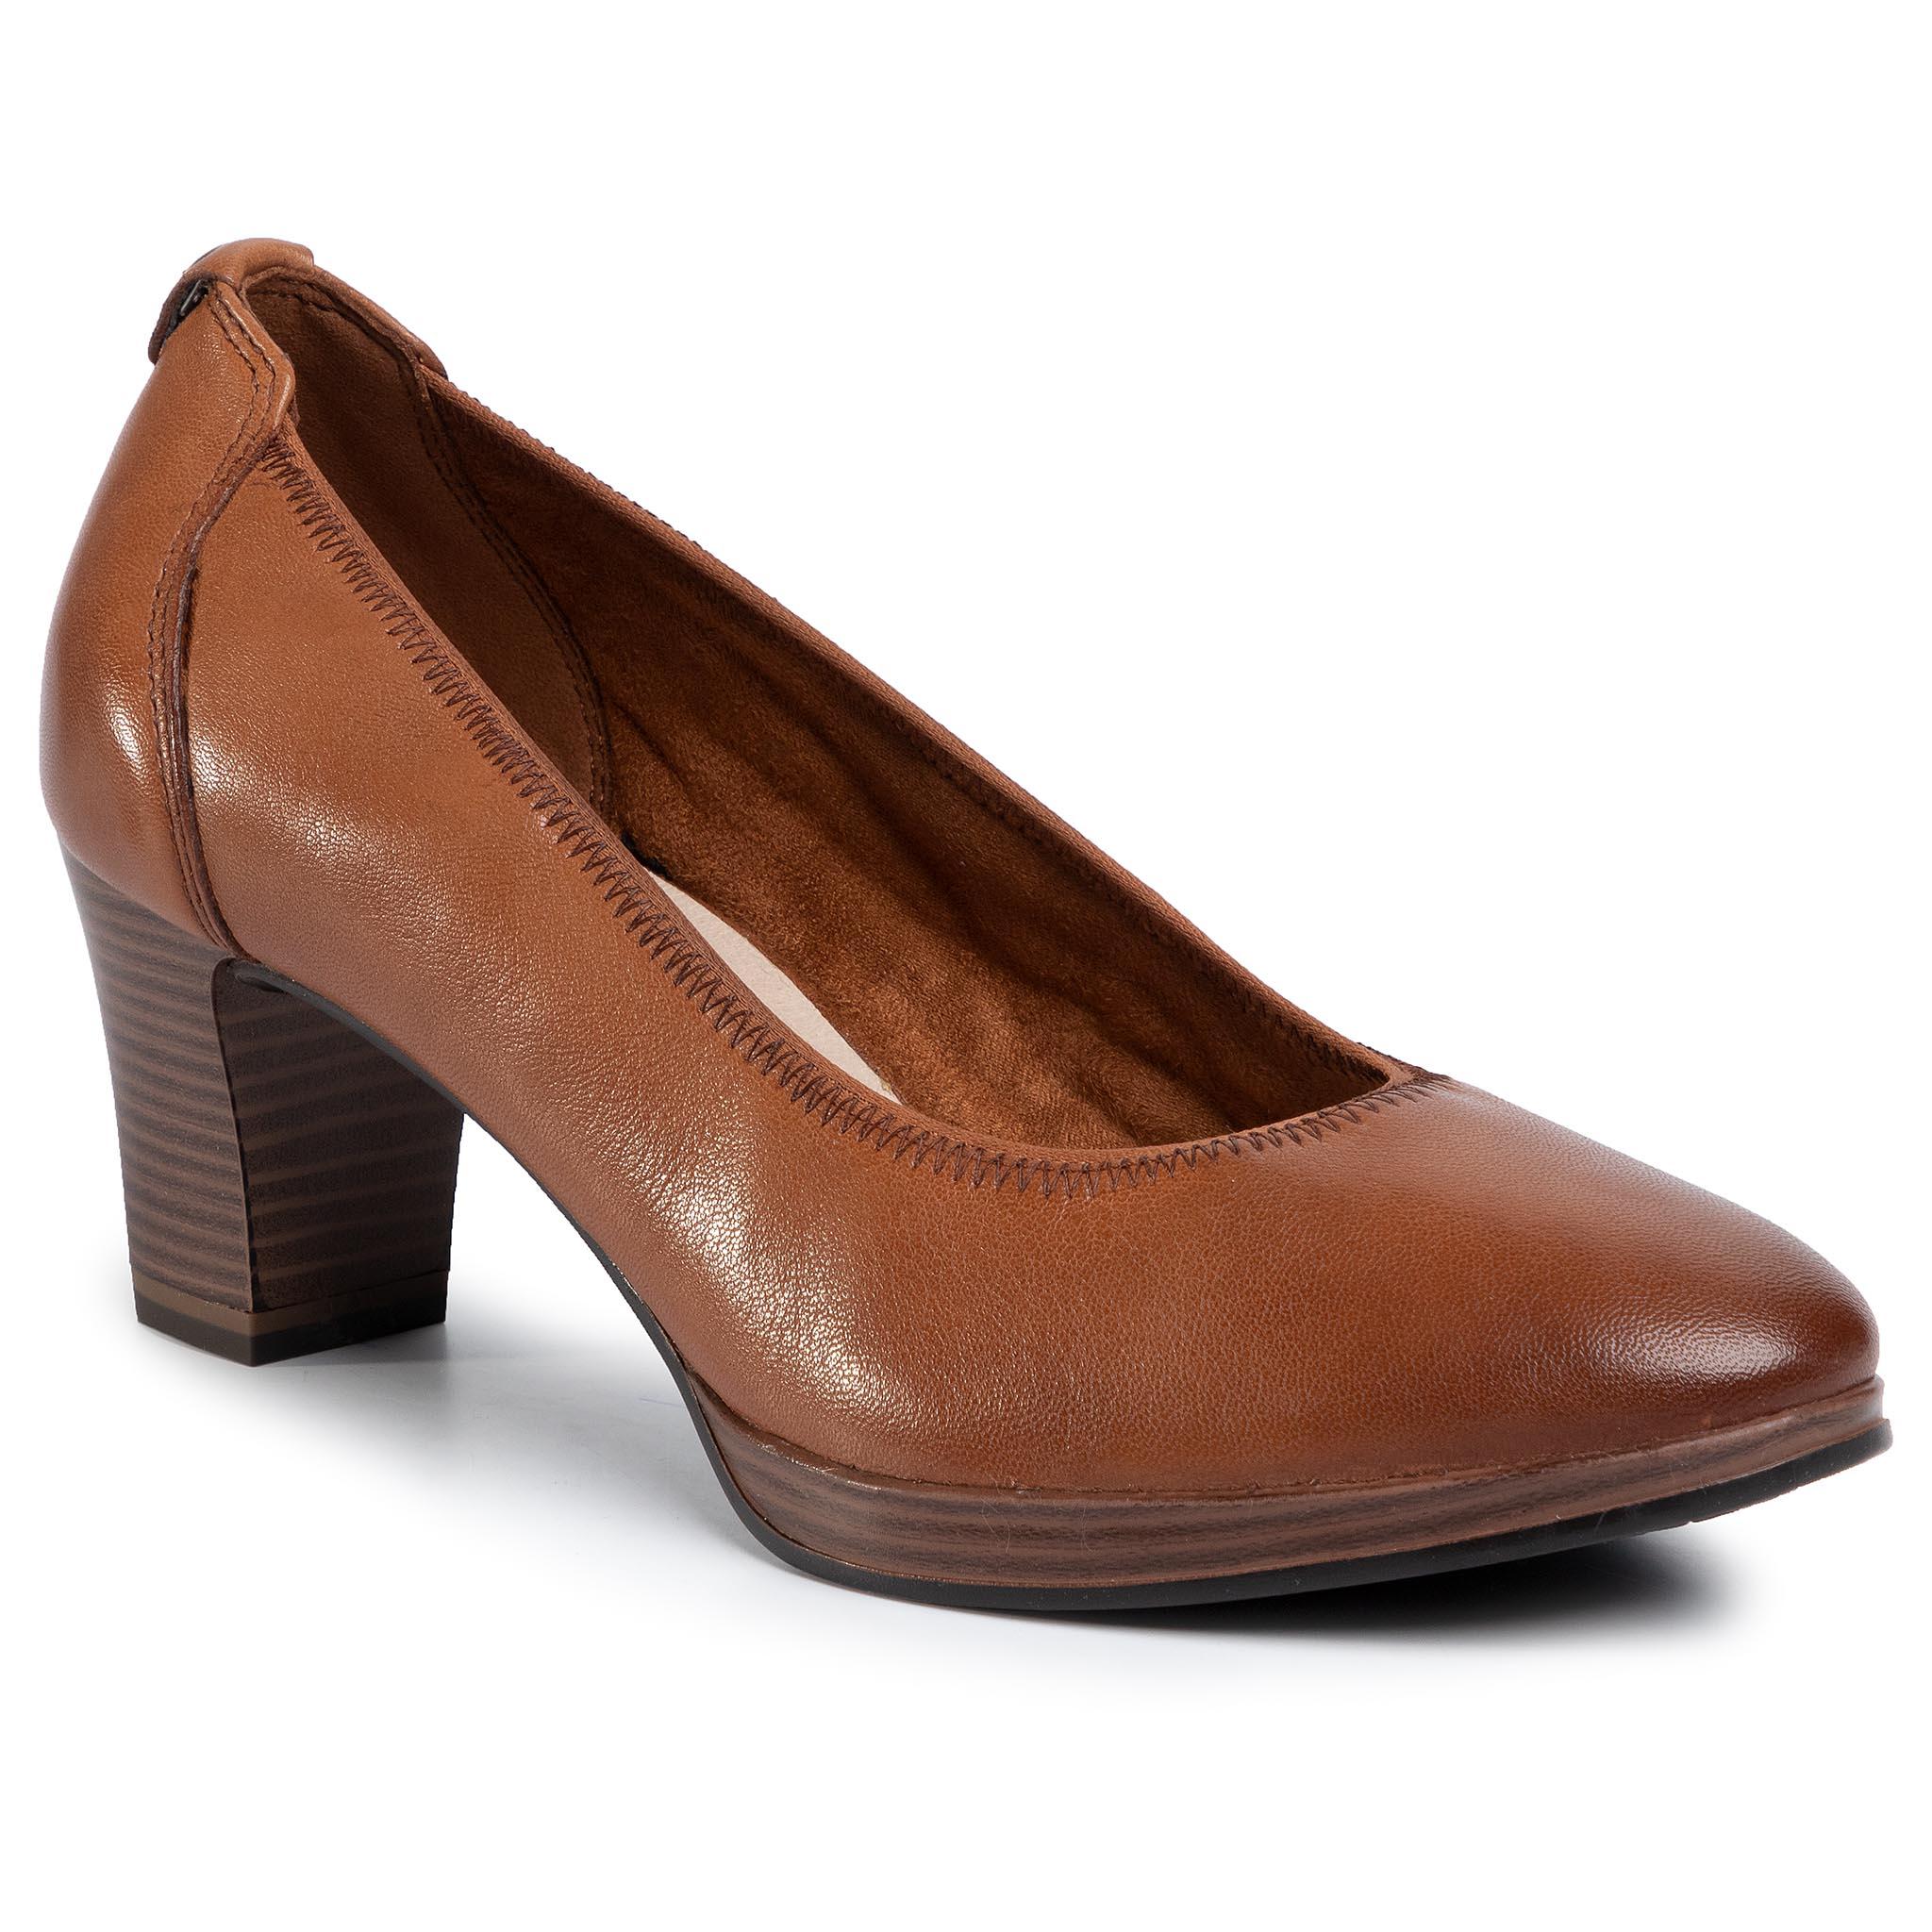 Boots TAMARIS 1 25701 23 Muscat 311 Boots High boots